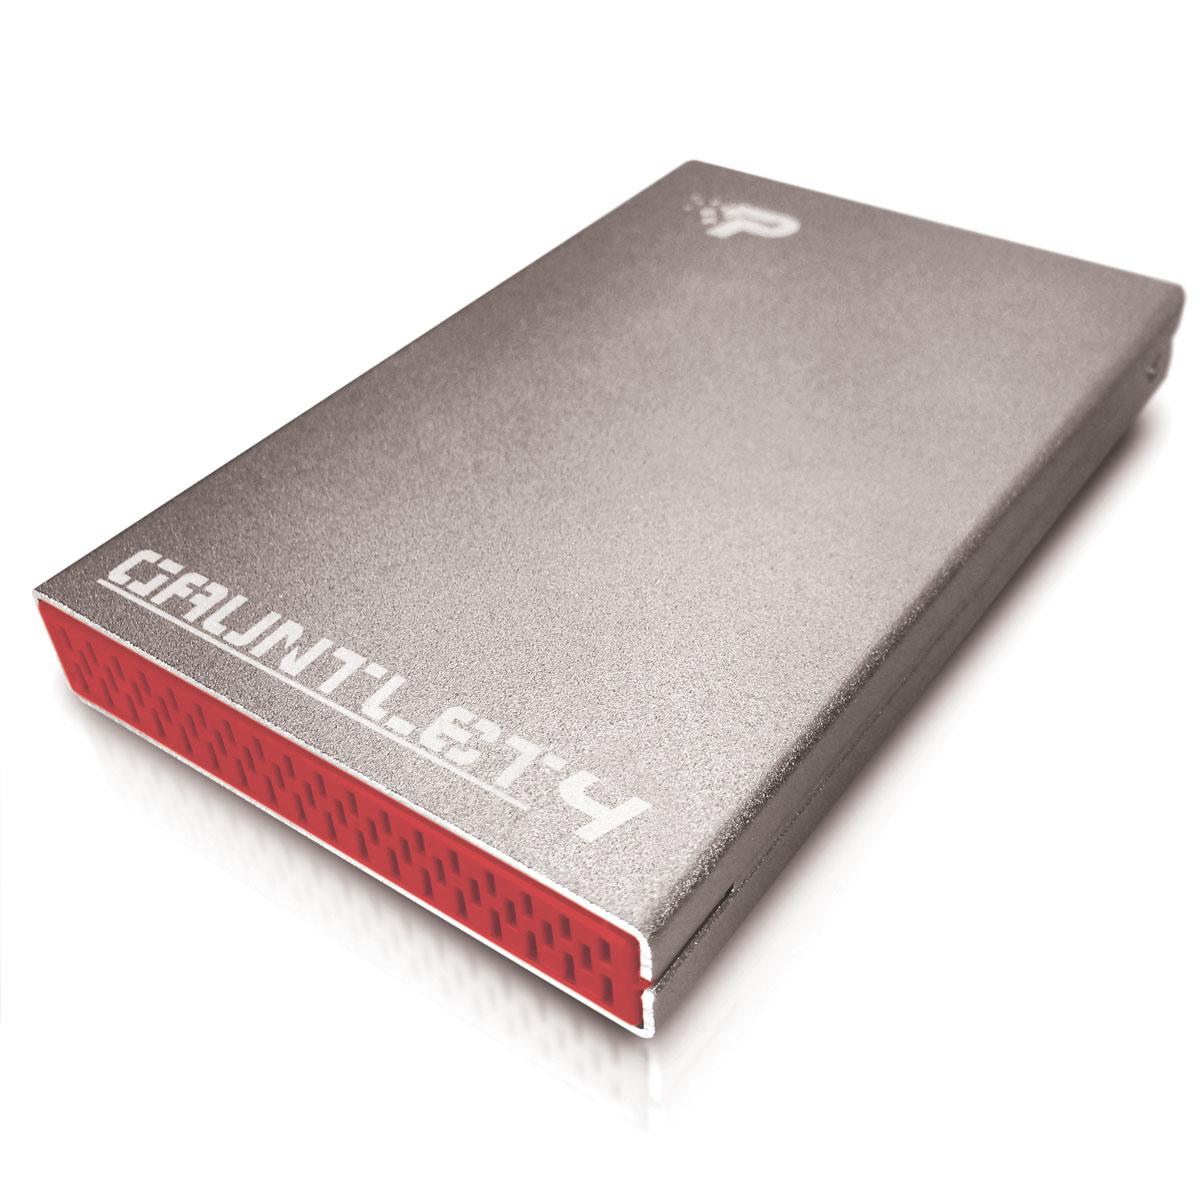 "Patriot Gauntlet 4 Aluminum USB 3.1 externí box pro SSD a HDD 2,5"""